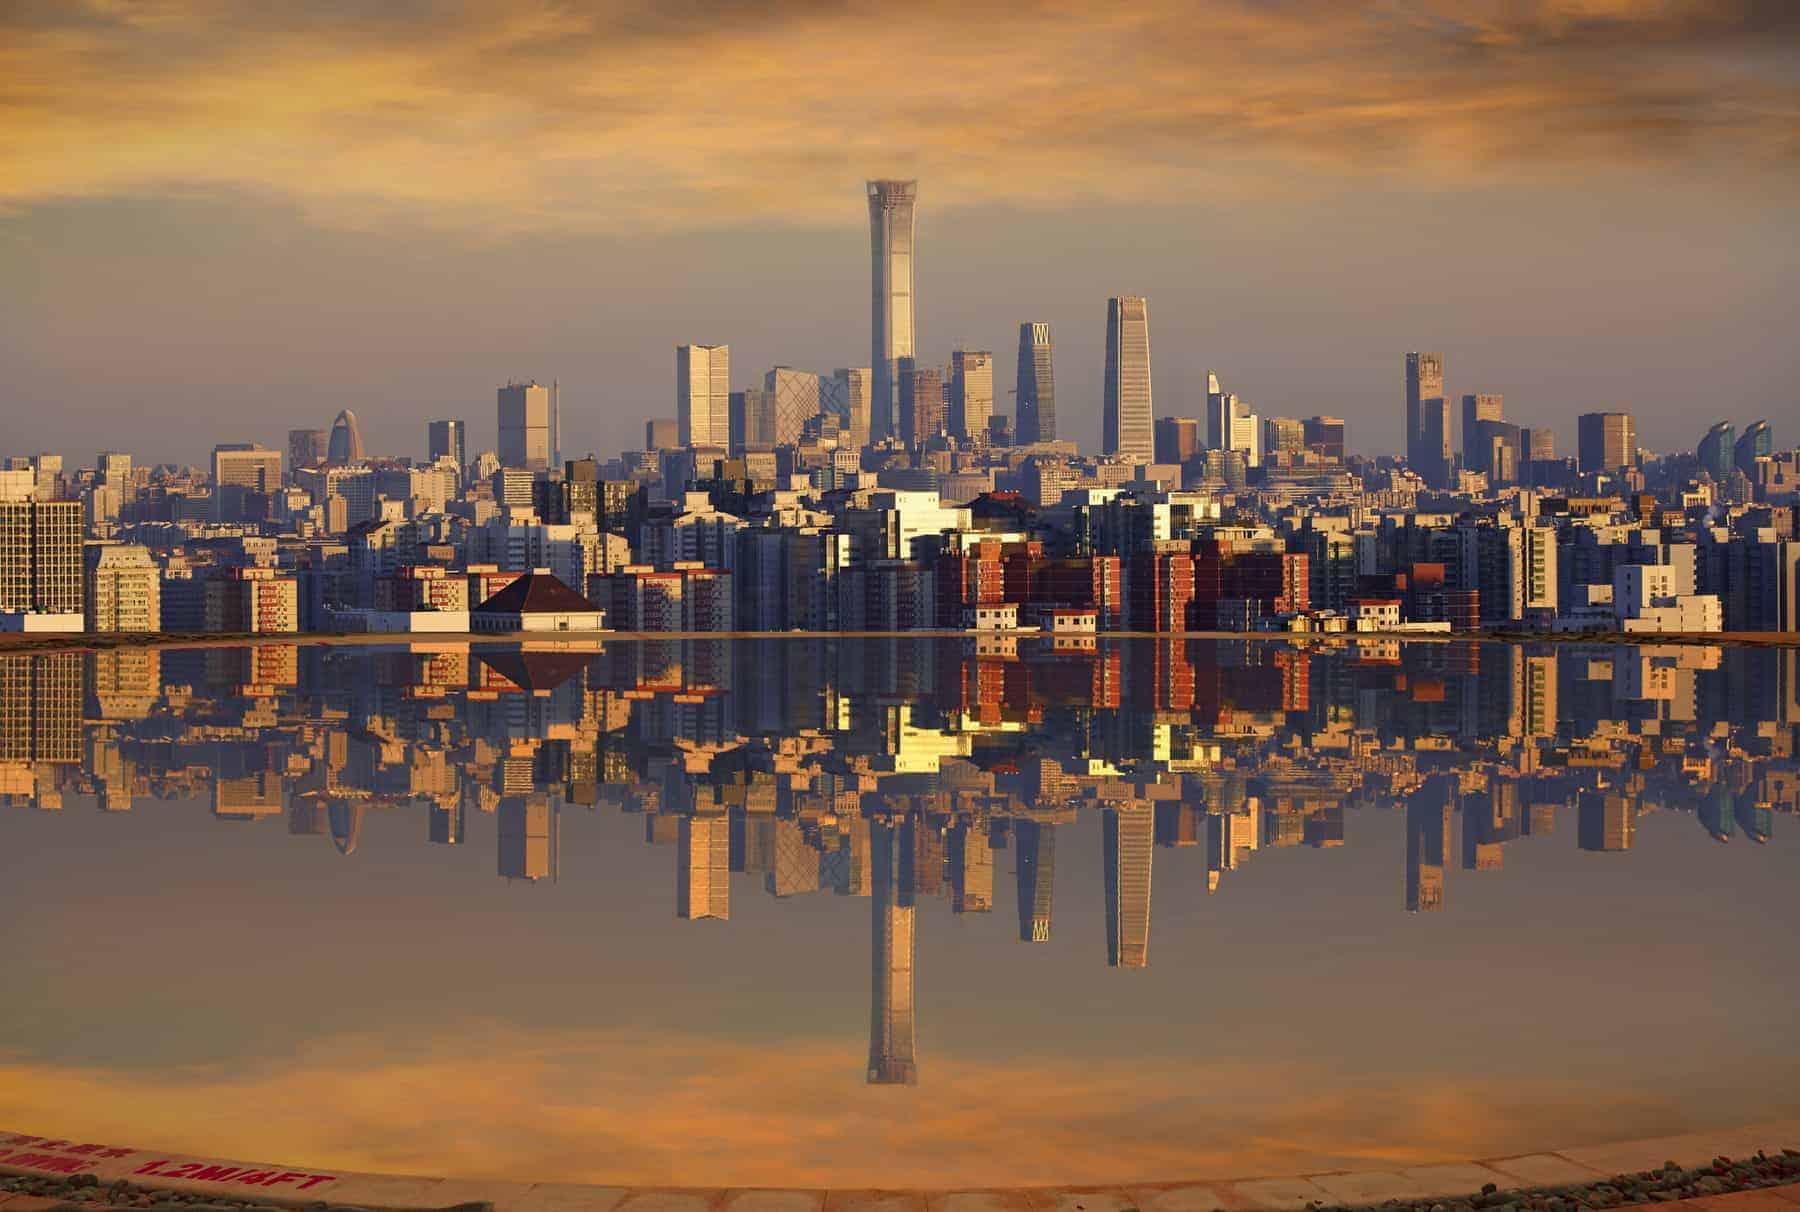 Beijing, the modern metropolis